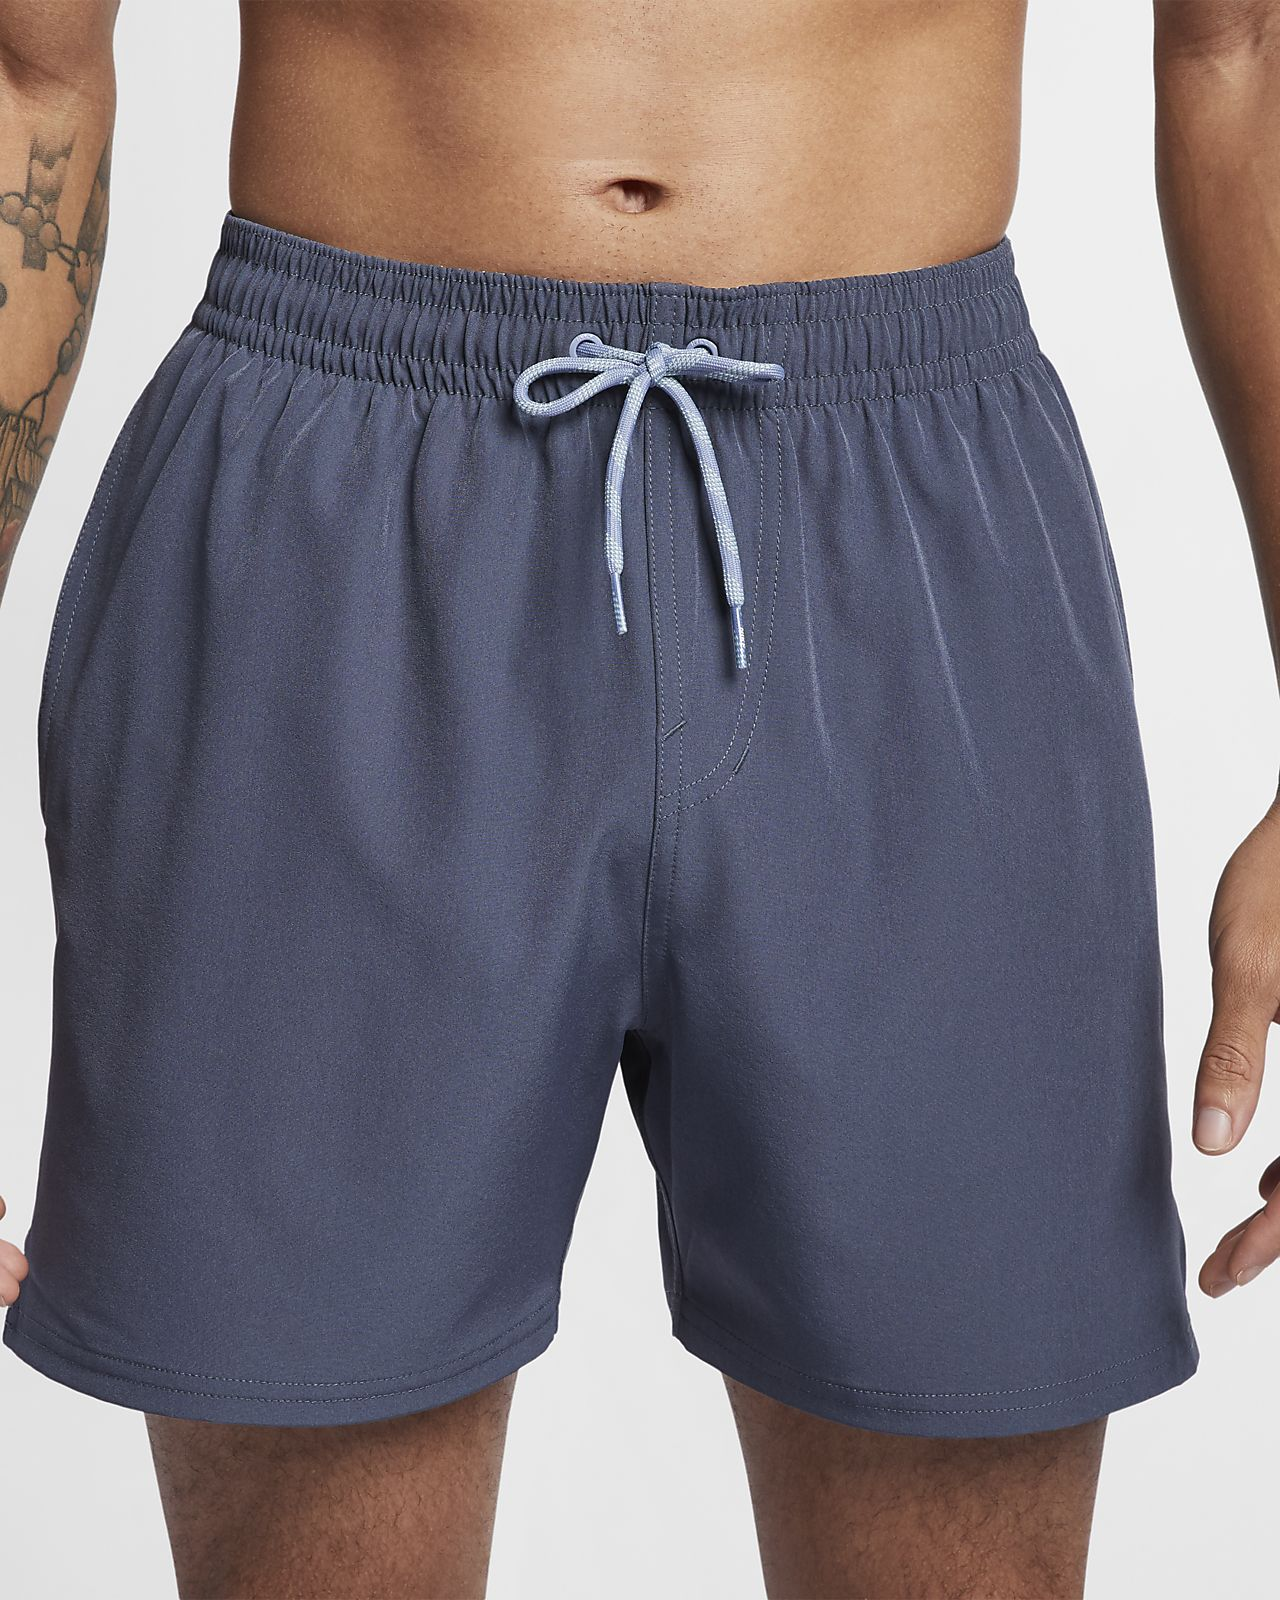 2963a8232053 Nike Swim Retro Stripe Lap Men s 13cm (approx.) Swimming Trunks ...